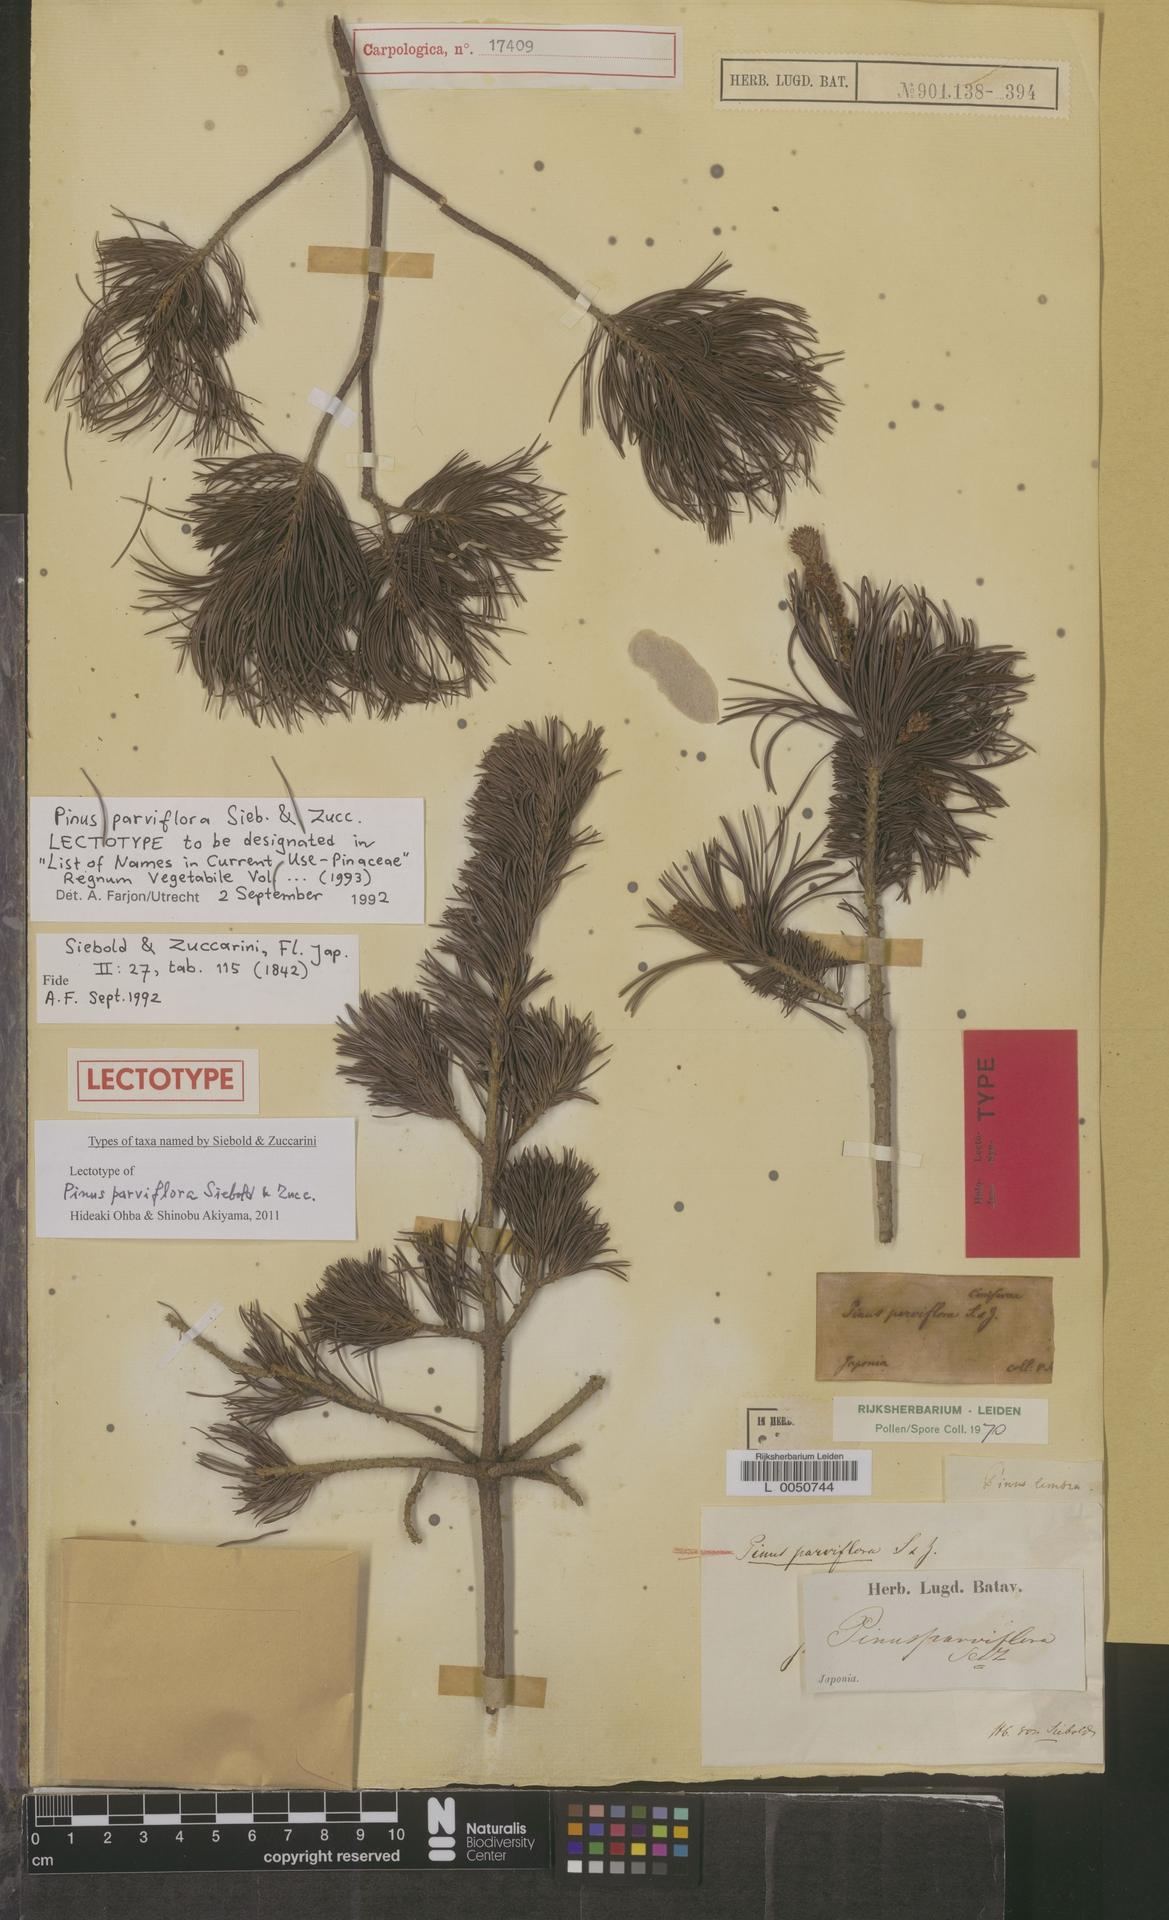 L  0050744 | Pinus parviflora Siebold & Zucc.